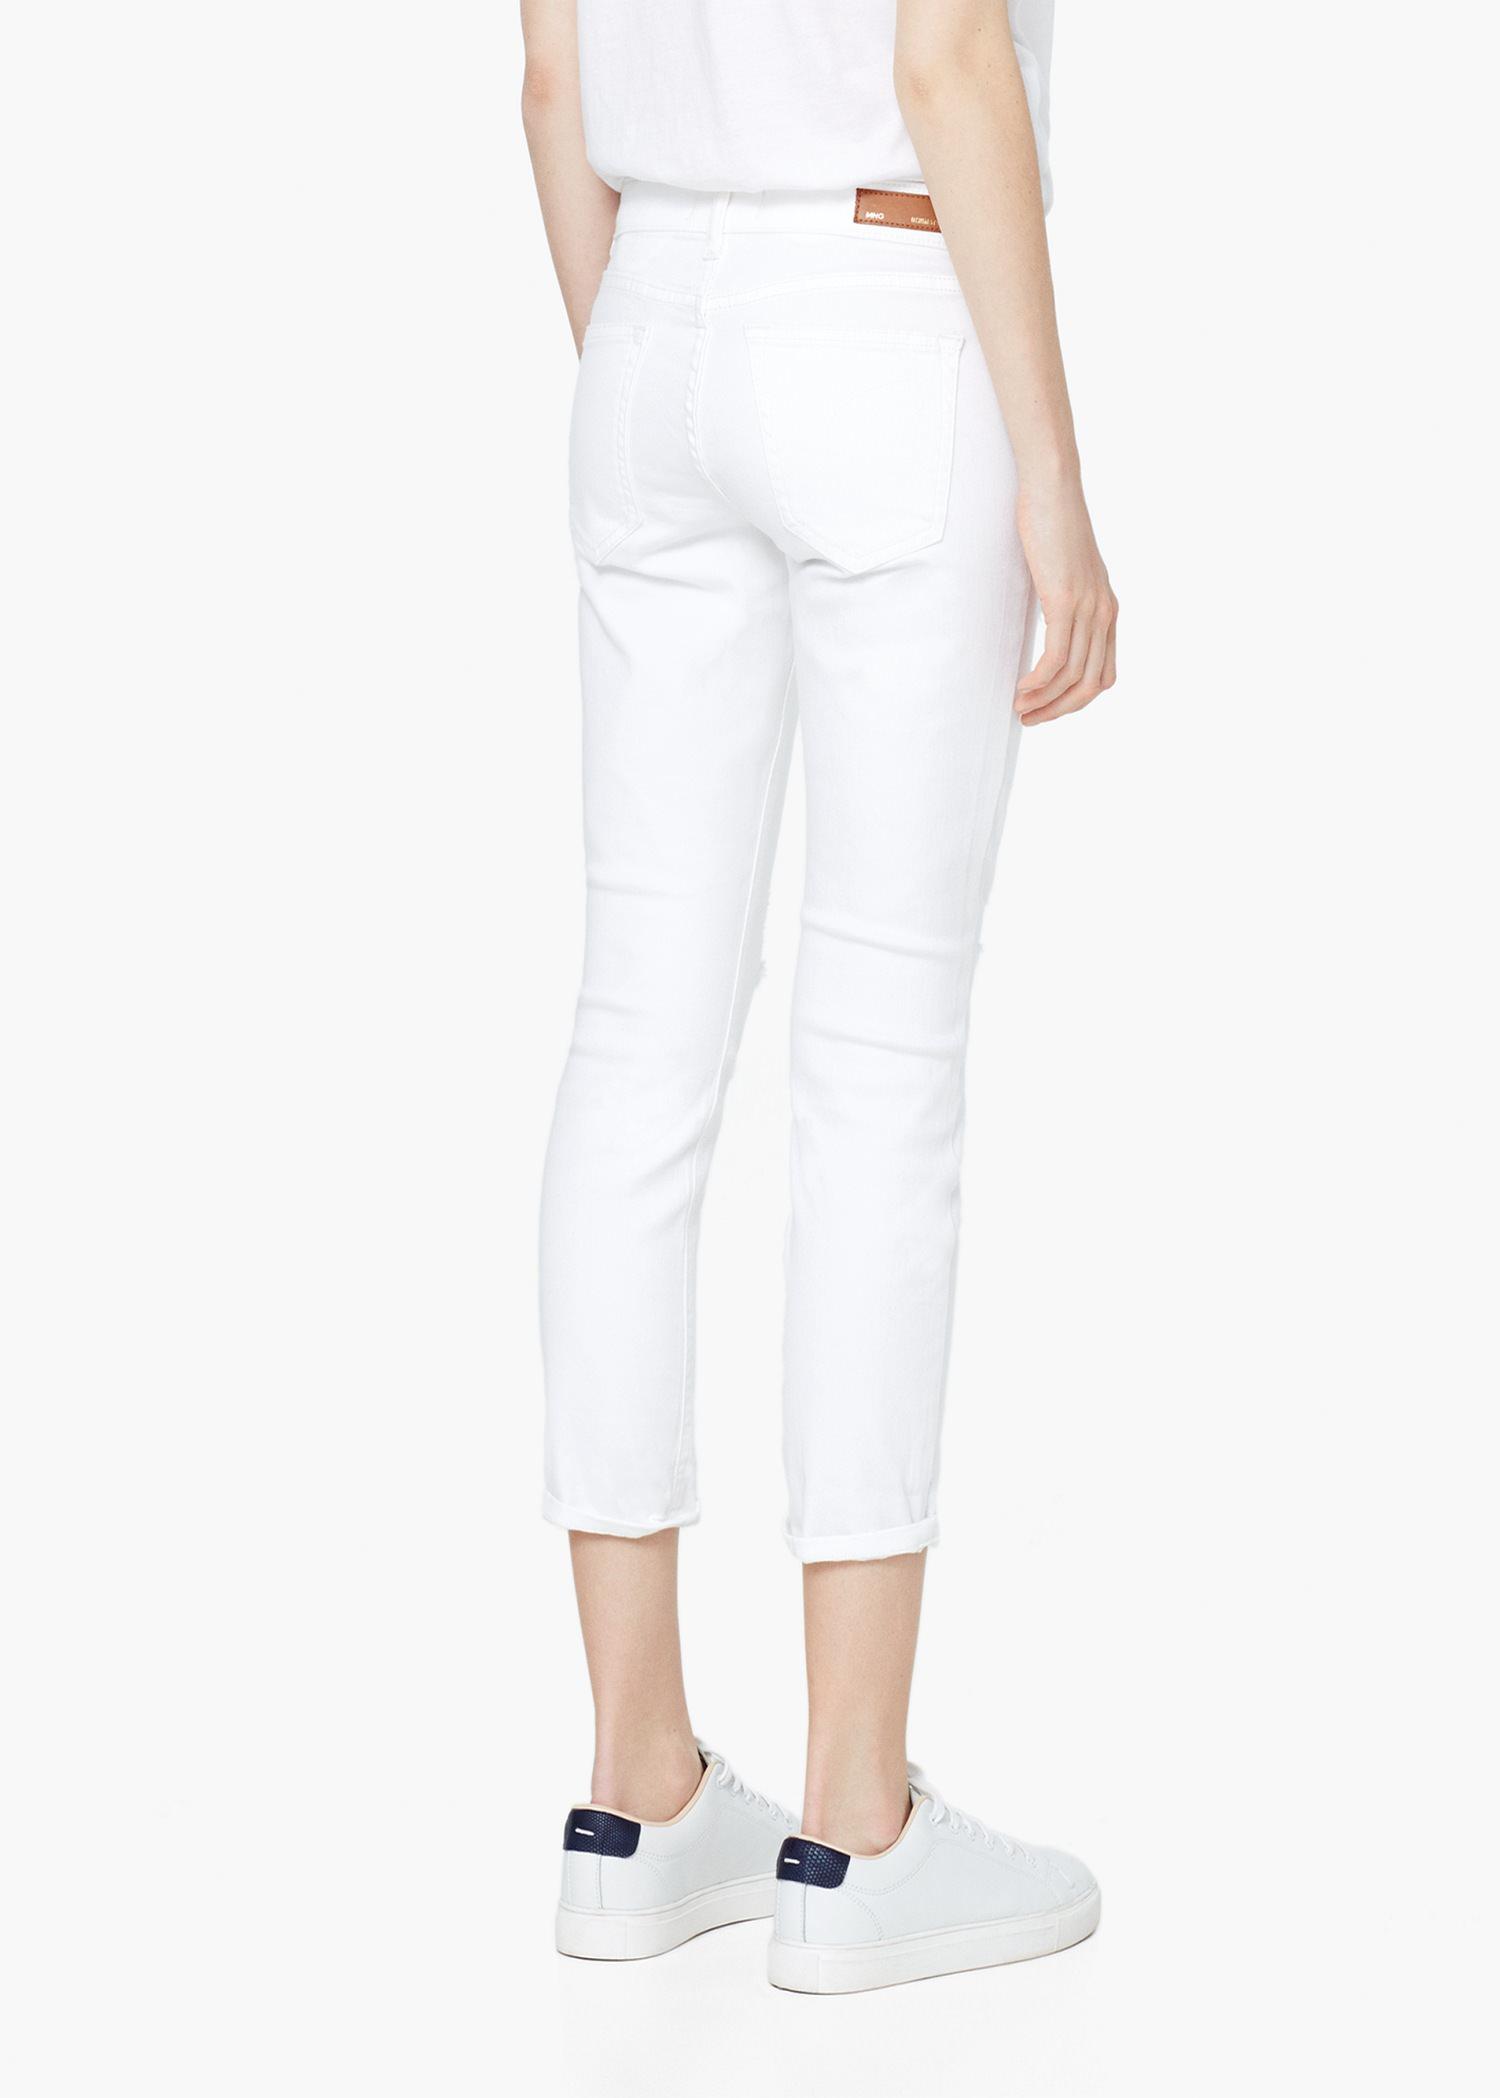 eea63fa462 Lyst - Mango Nancy Slim Cropped Jeans in White